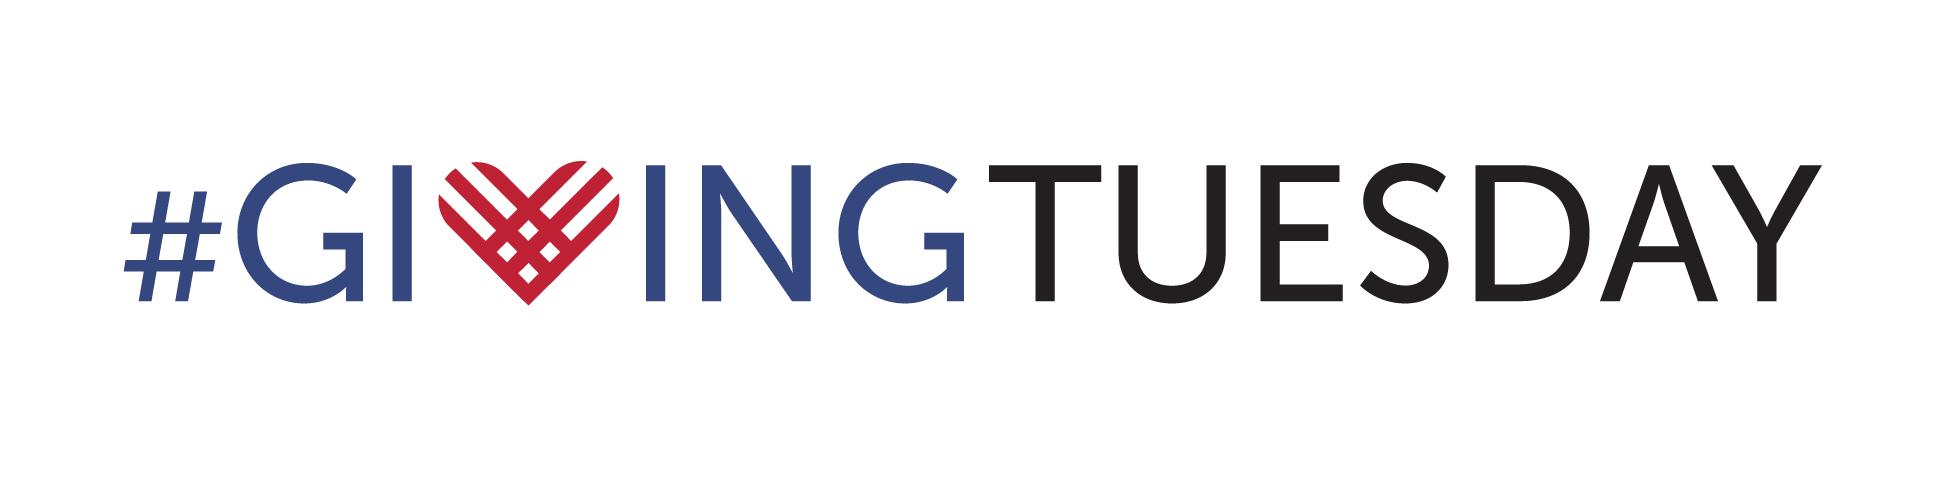 Giving Tuesday Logo.jpg